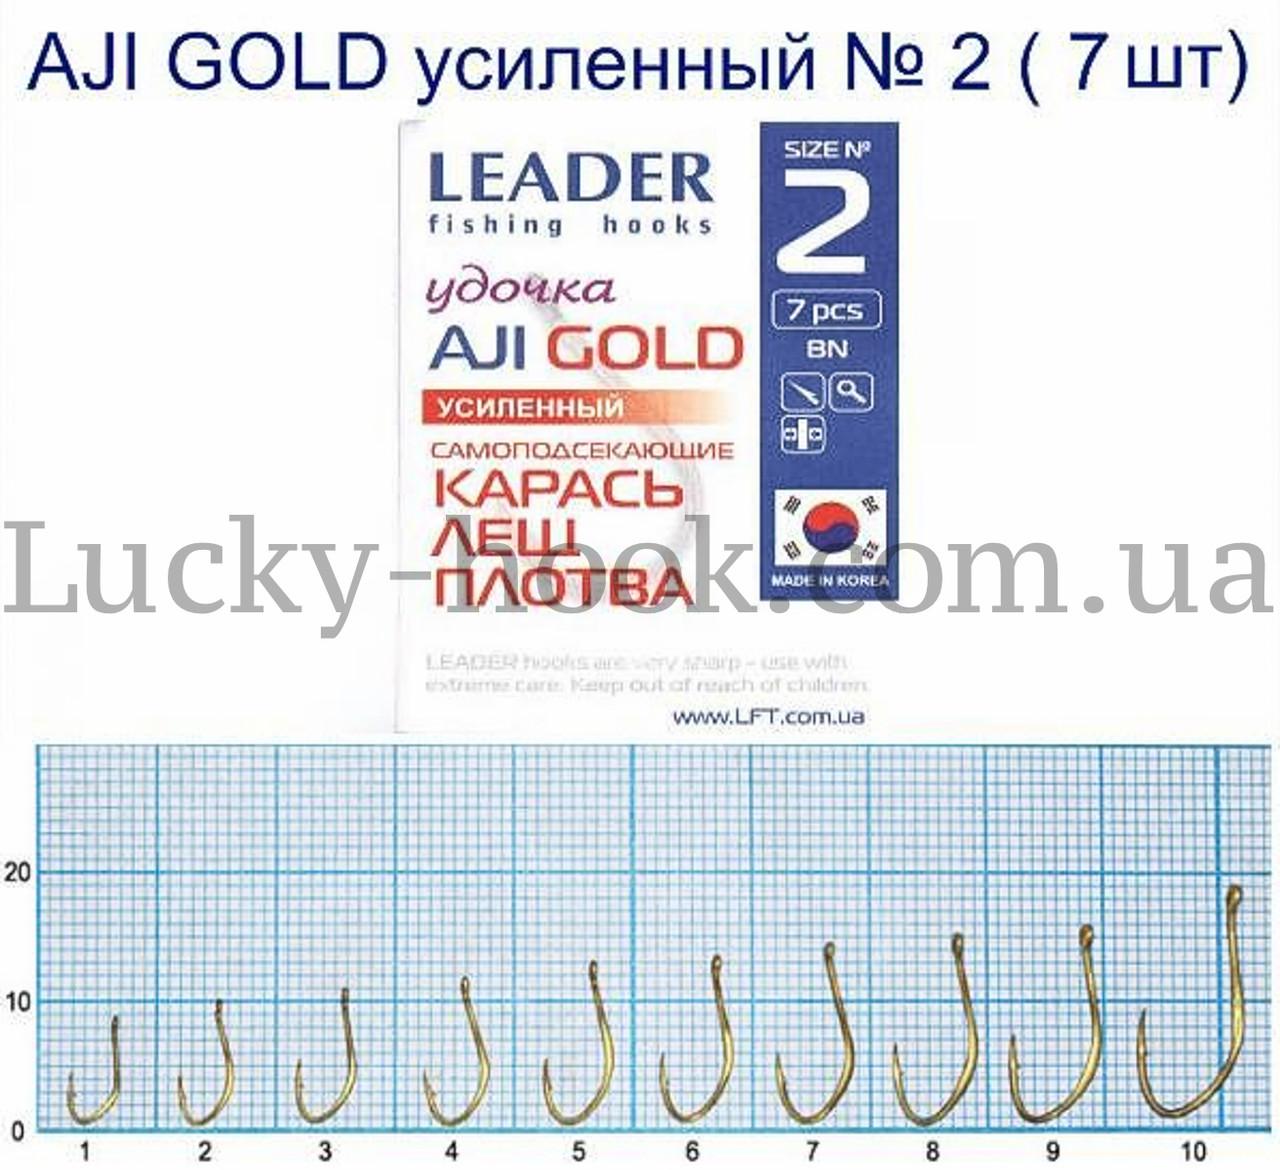 Крючок Leader удочка AJI GOLD самоподсекающие Карась, лещ, плотва  № 2